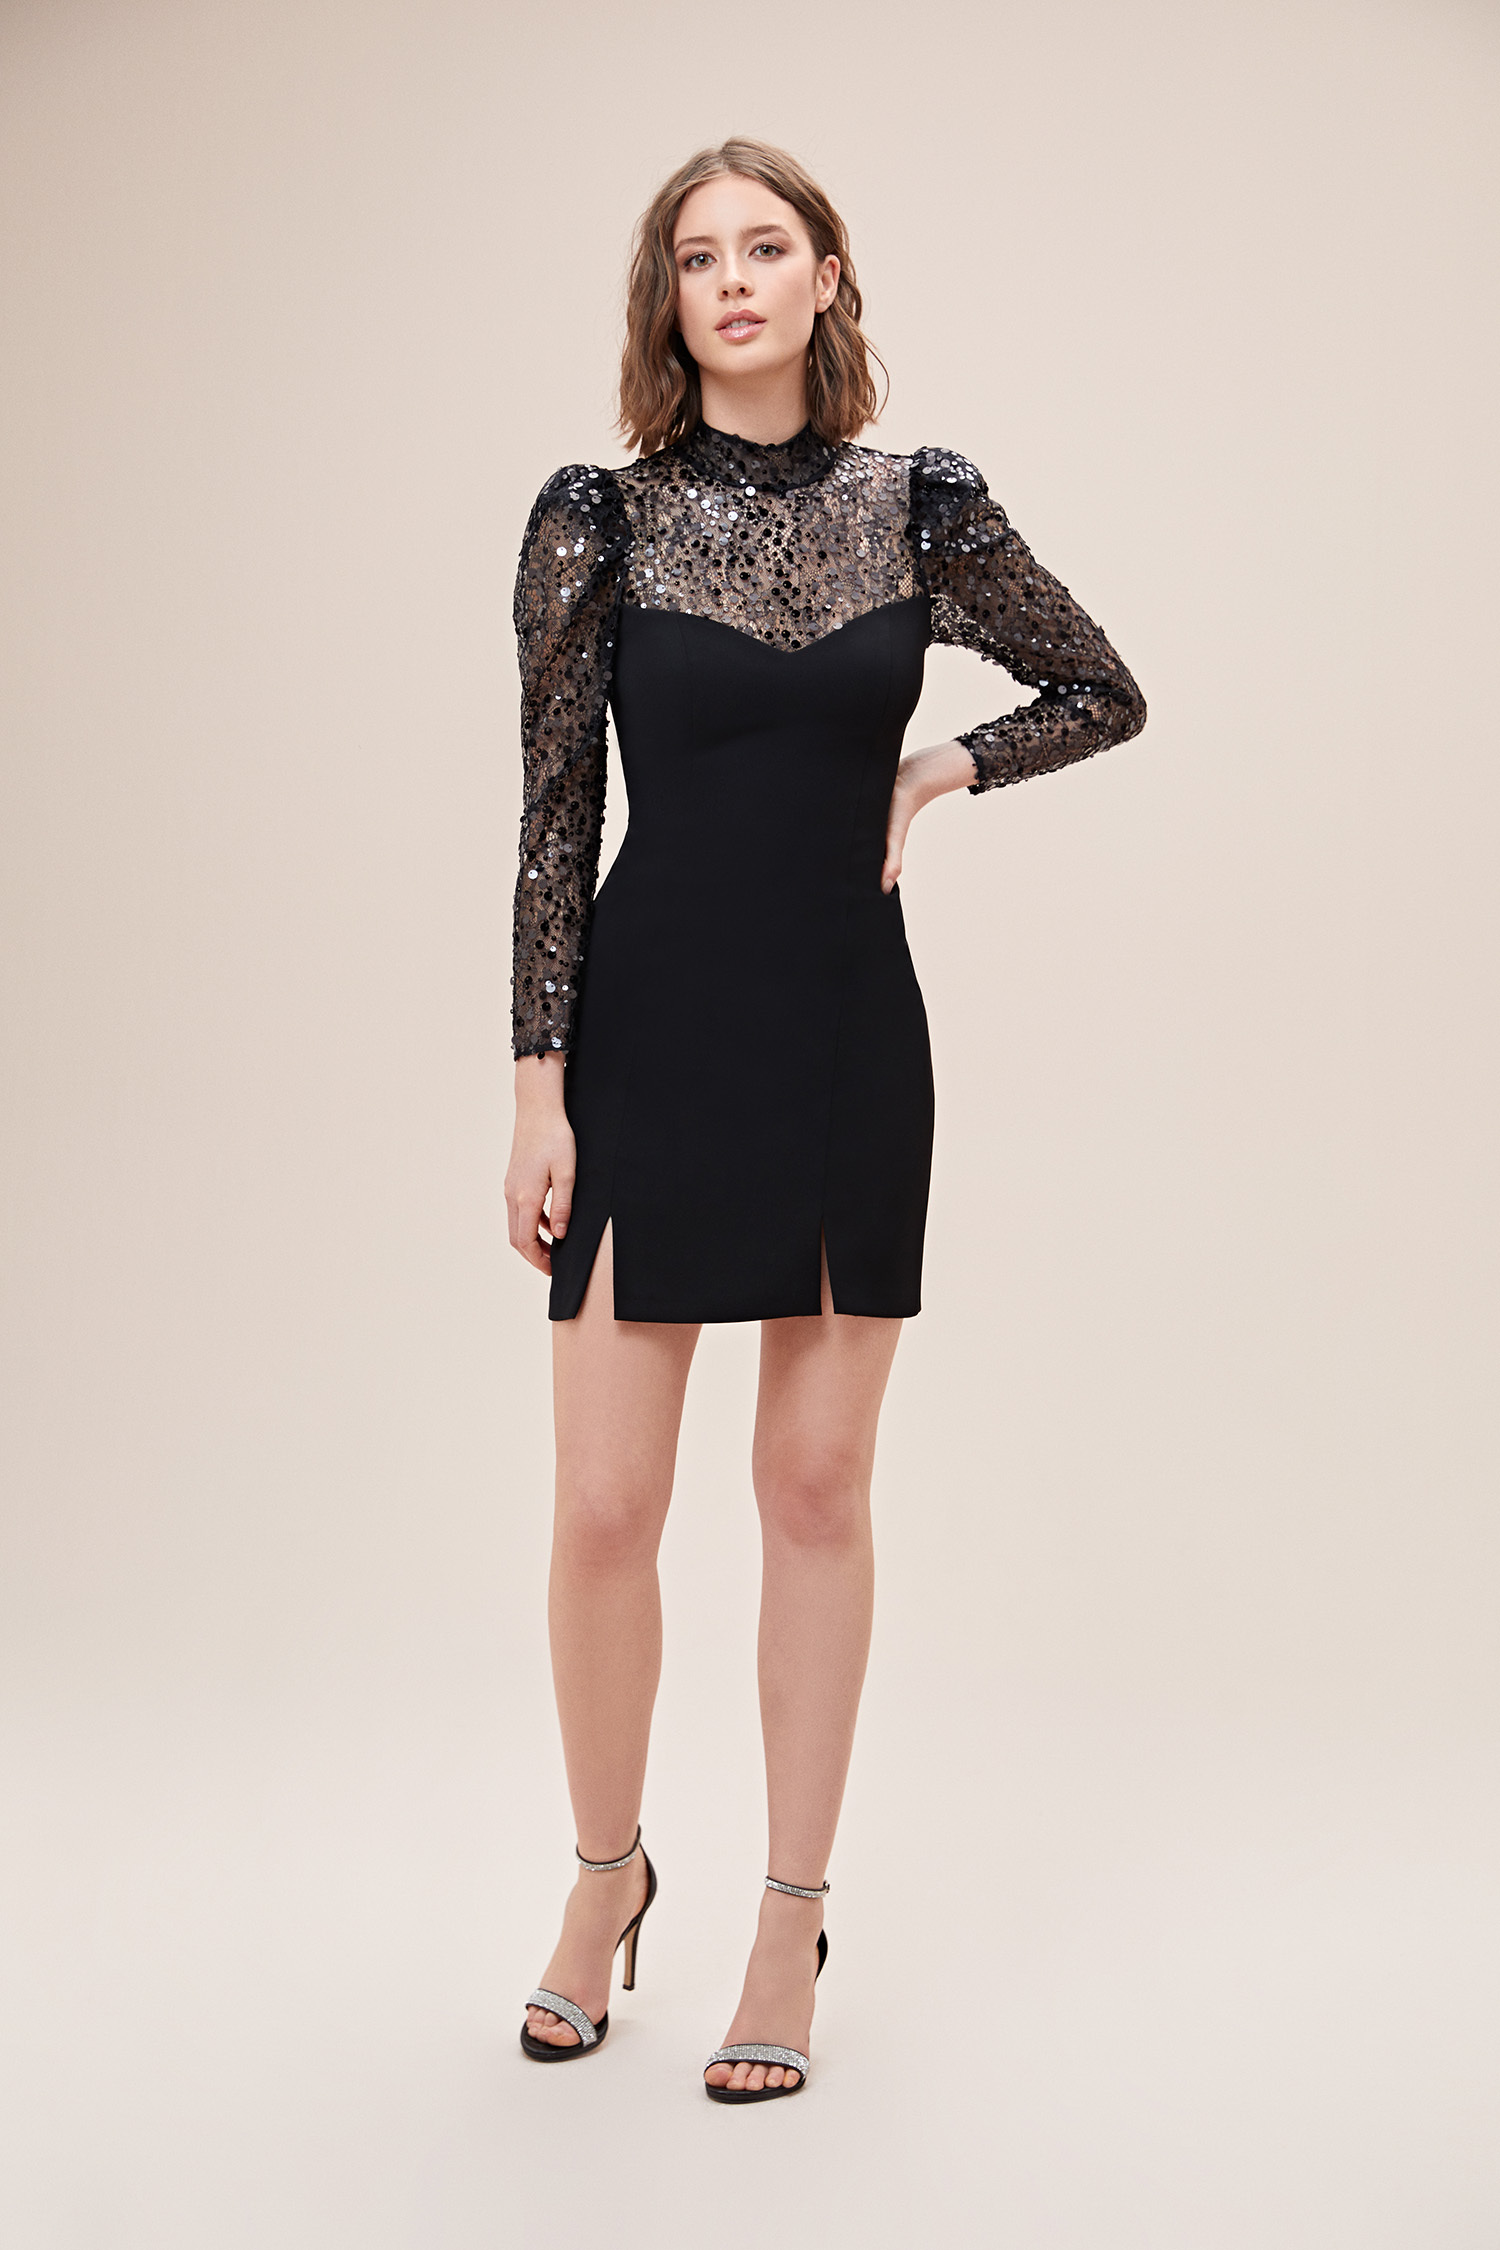 Siyah Uzun Kollu Pullu Jarse Mini Elbise - Thumbnail